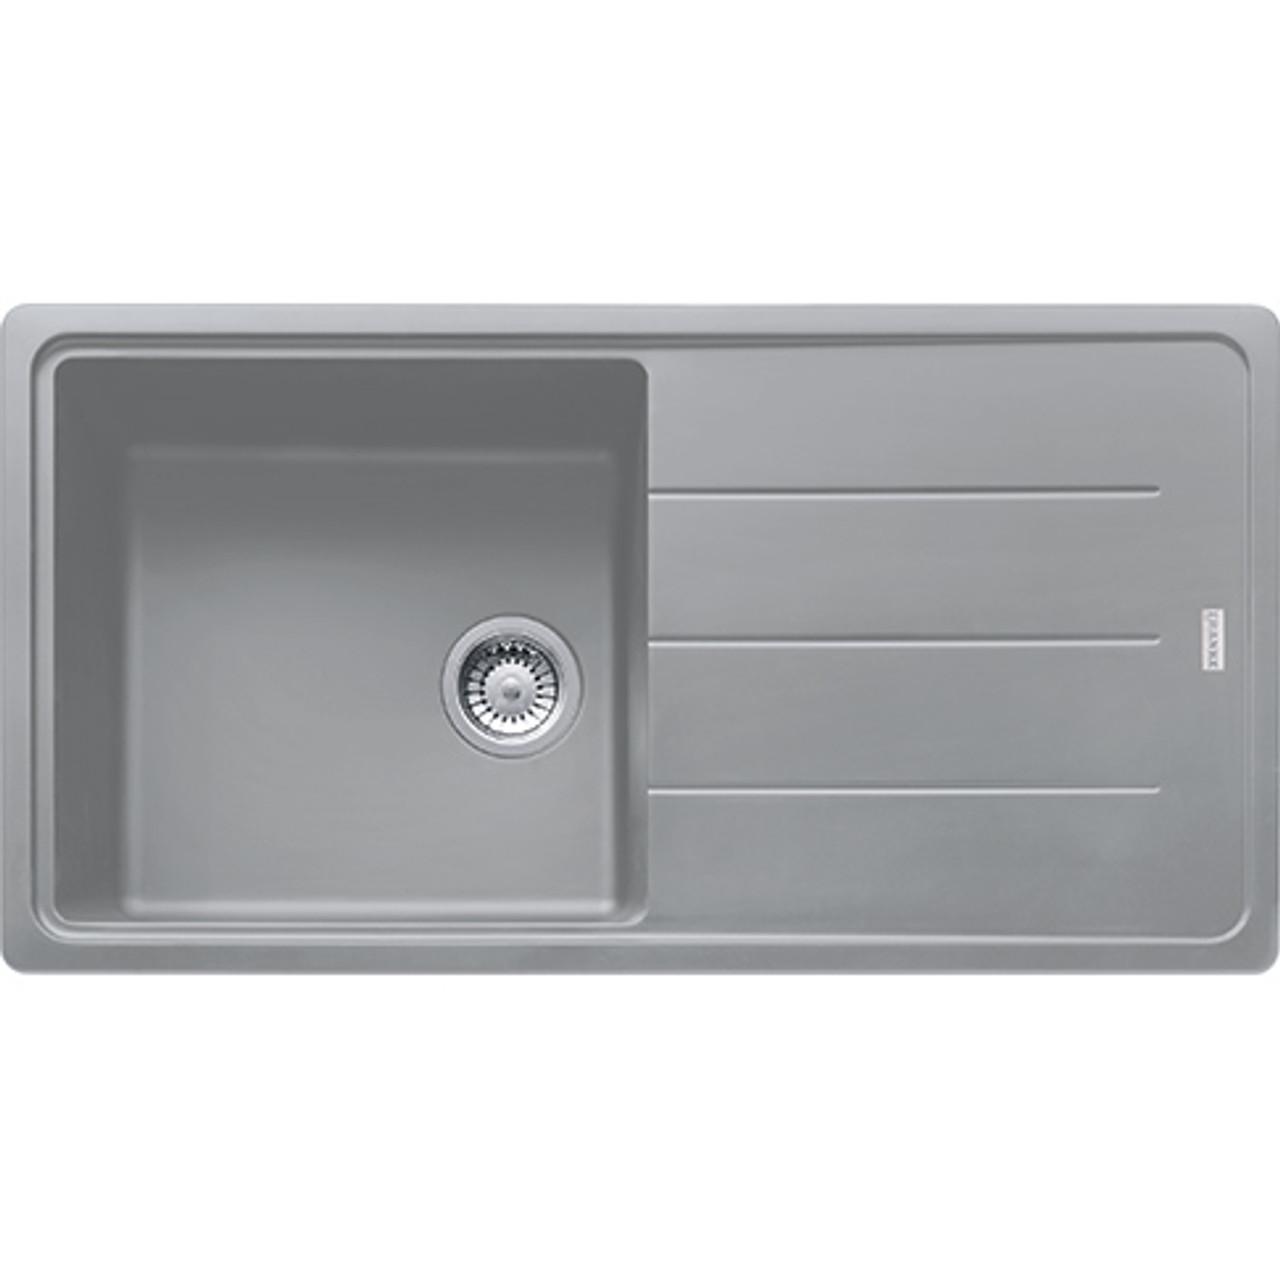 franke basis bfg611 970 reversible fragranite stone grey kitchen sink